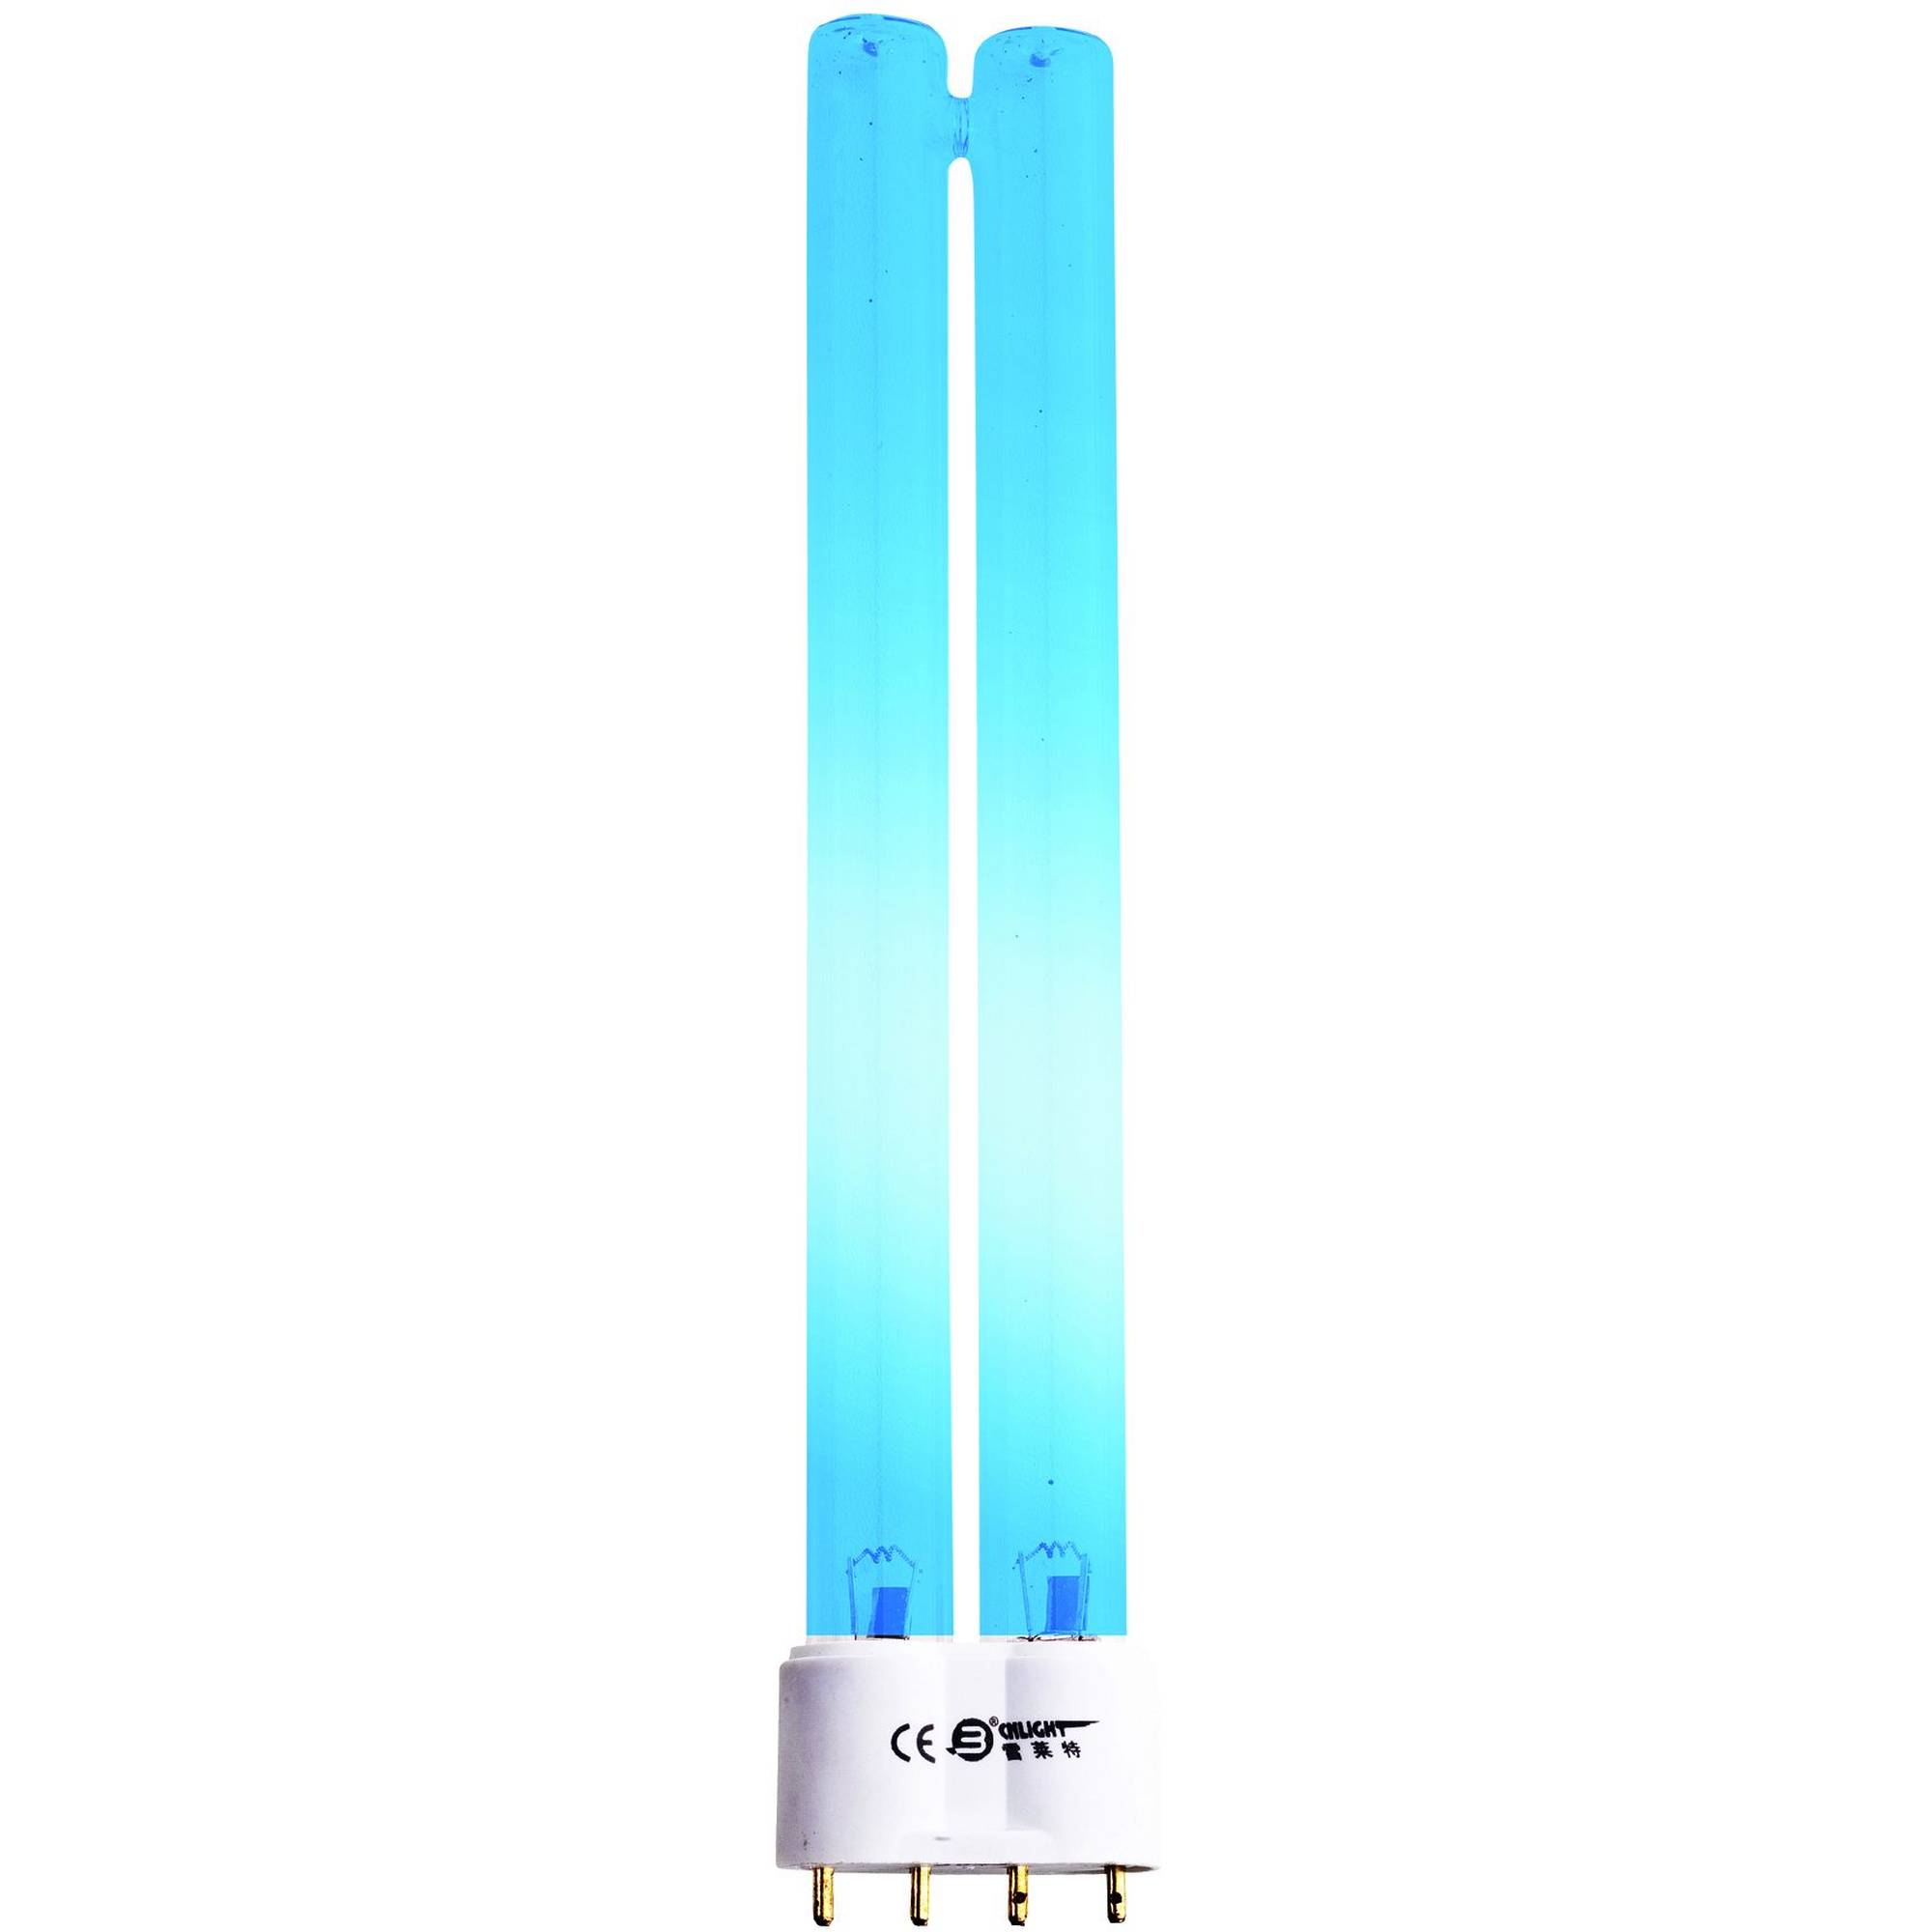 UVC Ersatzlampe 18 Watt Sockel PL-L 2G11 Austauschlampe